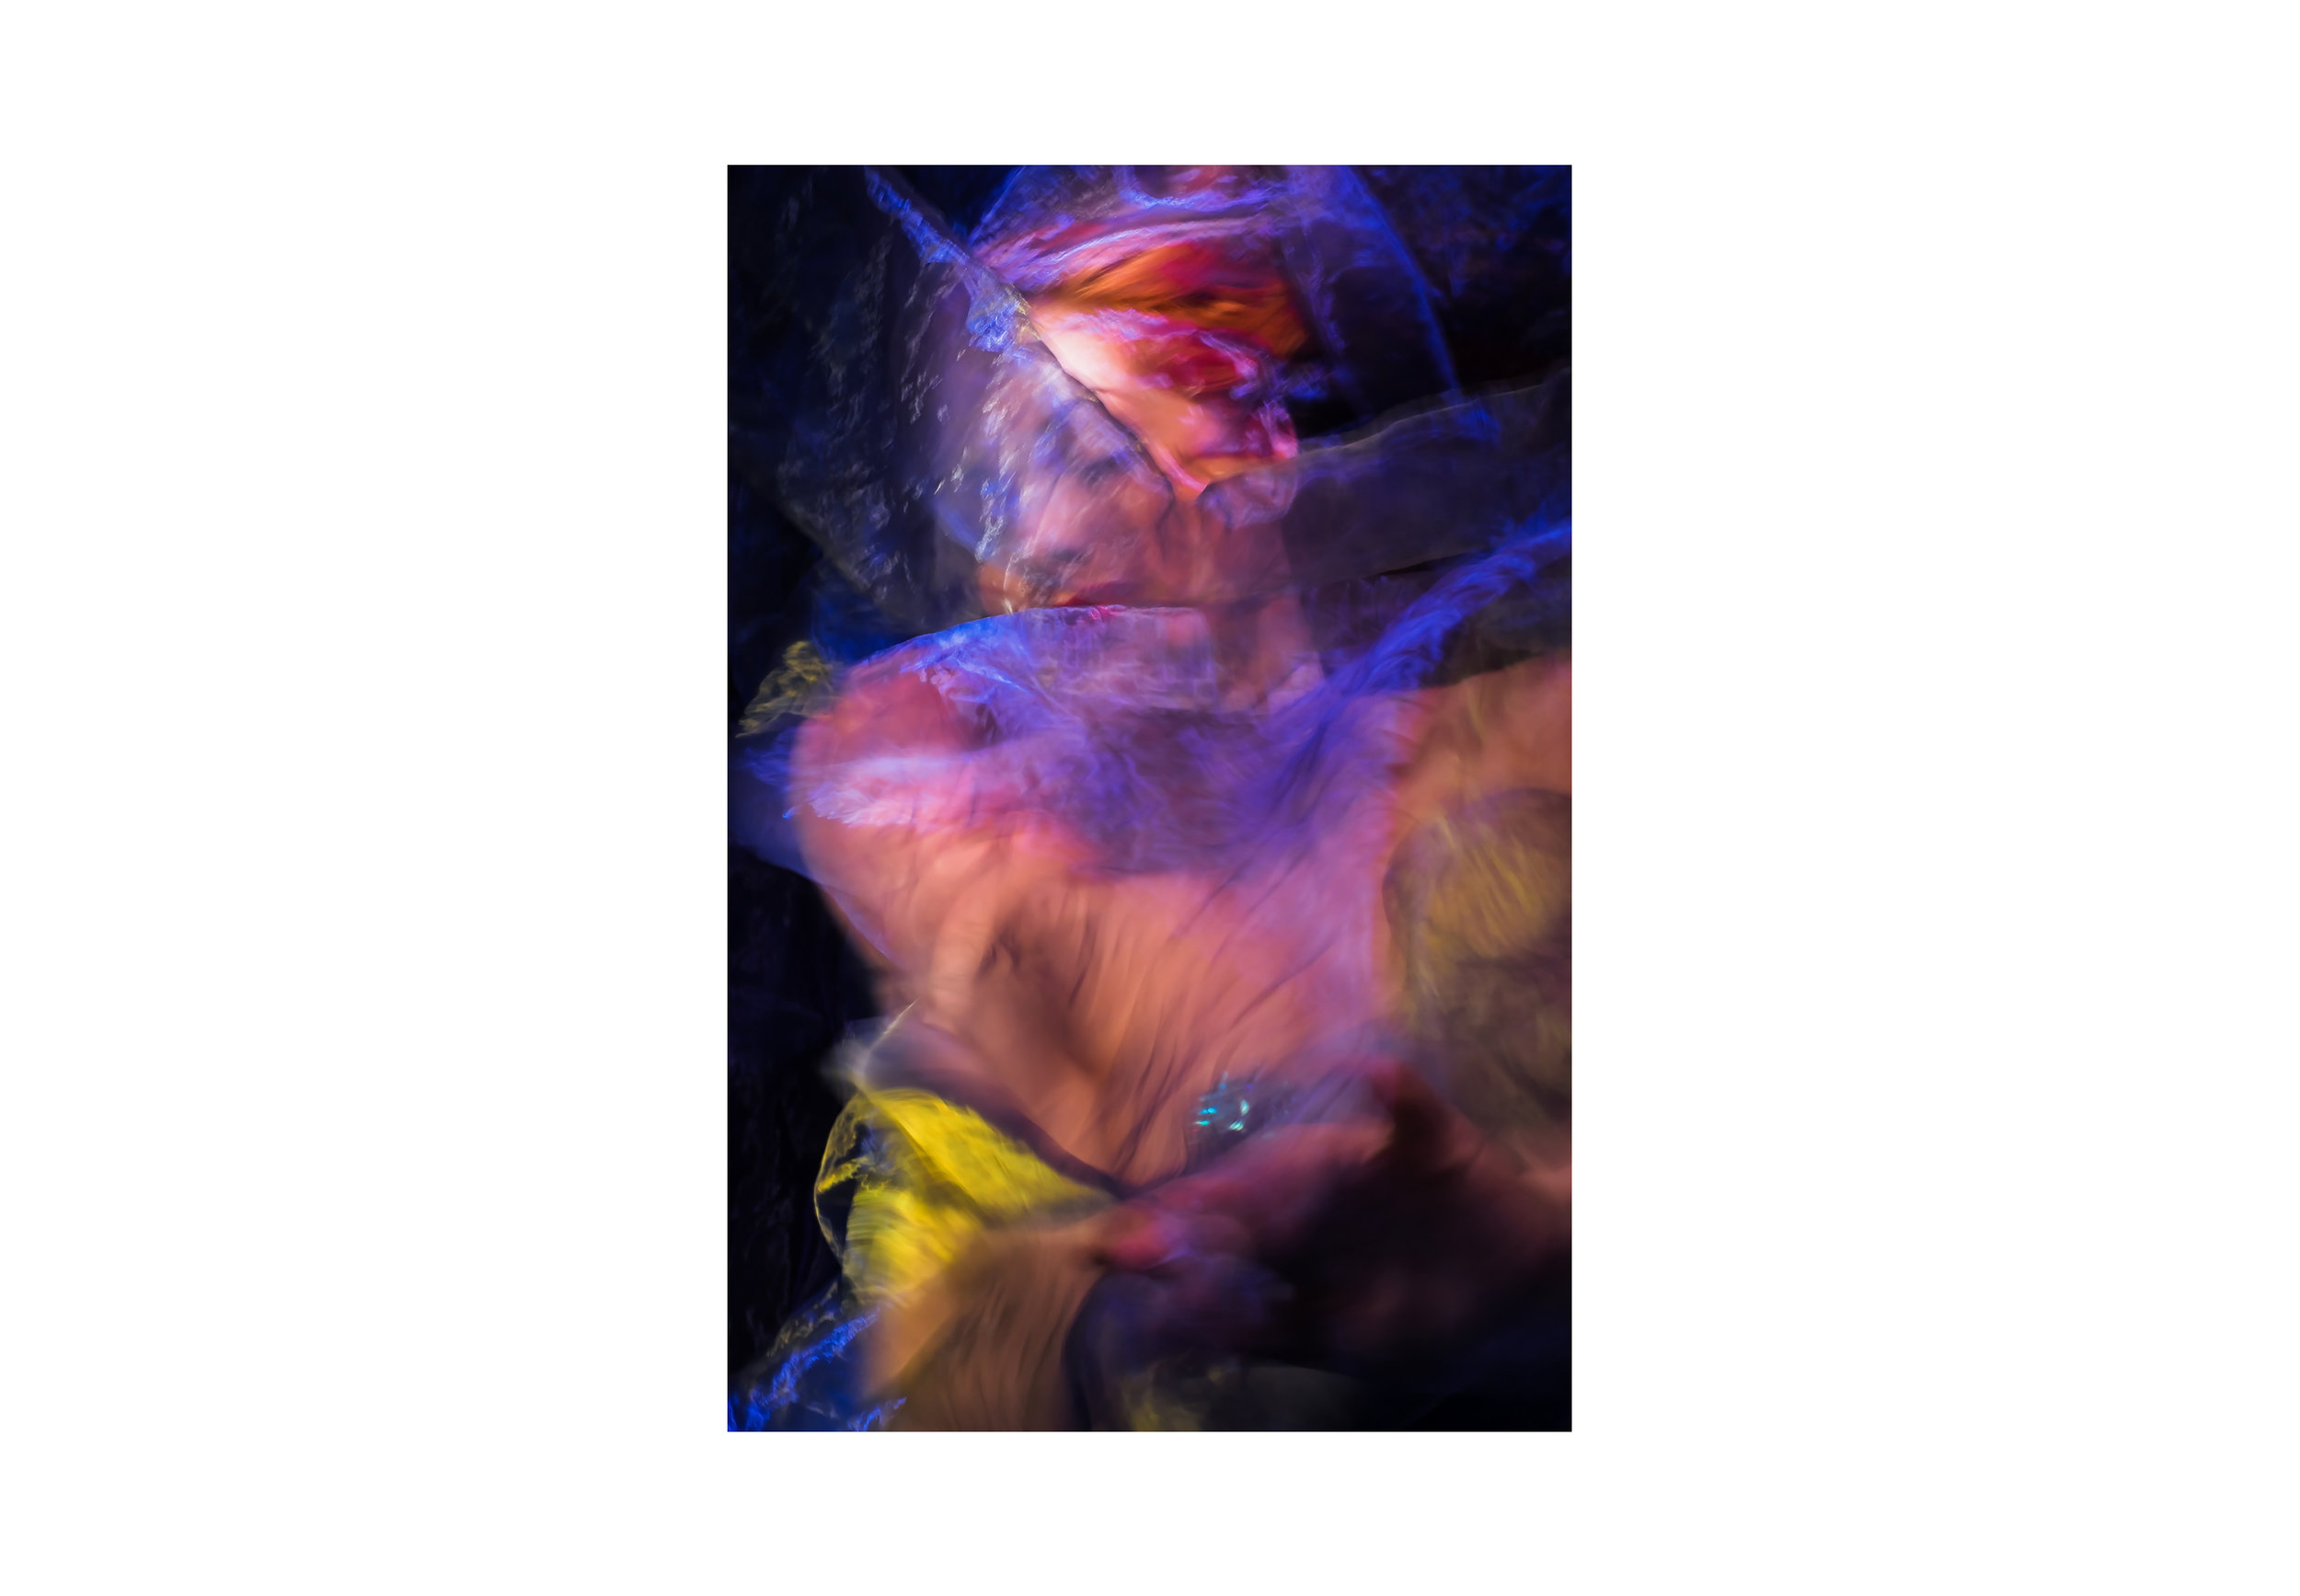 Banbury-Cross-Abstract-Beauty-Berlin-Matthew-Coleman-Photography.jpg